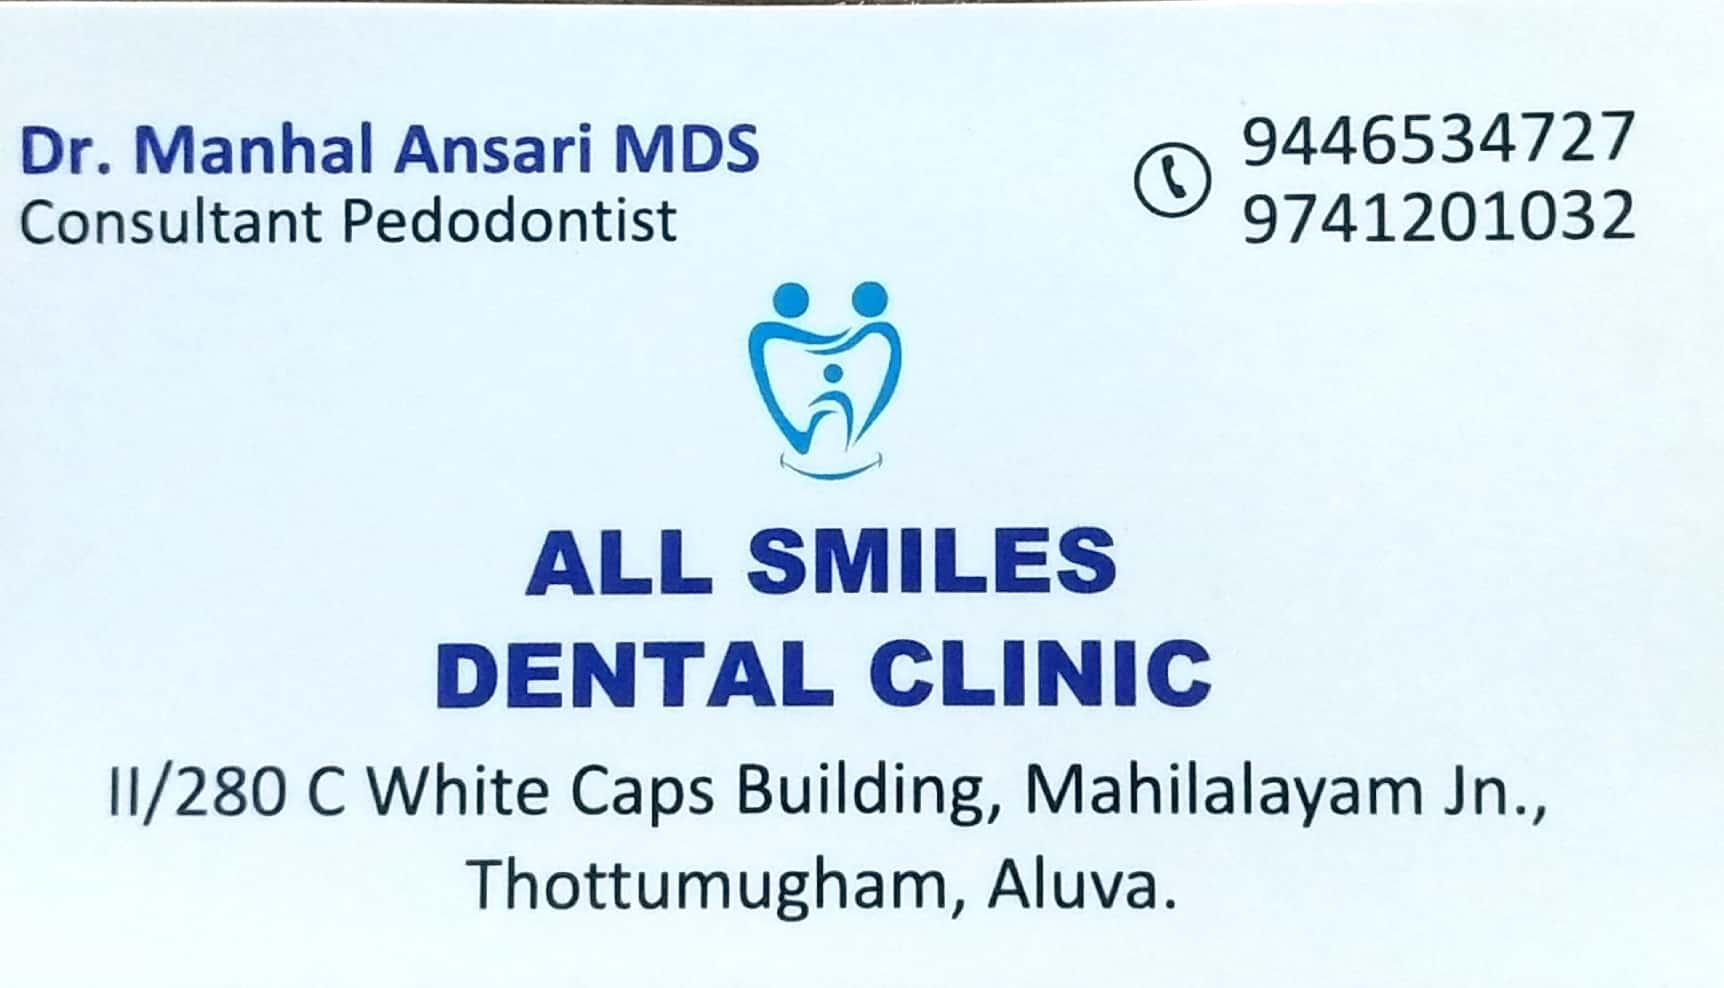 ALL SMILES DENTAL CLINIC, DENTAL CLINIC,  service in Aluva, Ernakulam